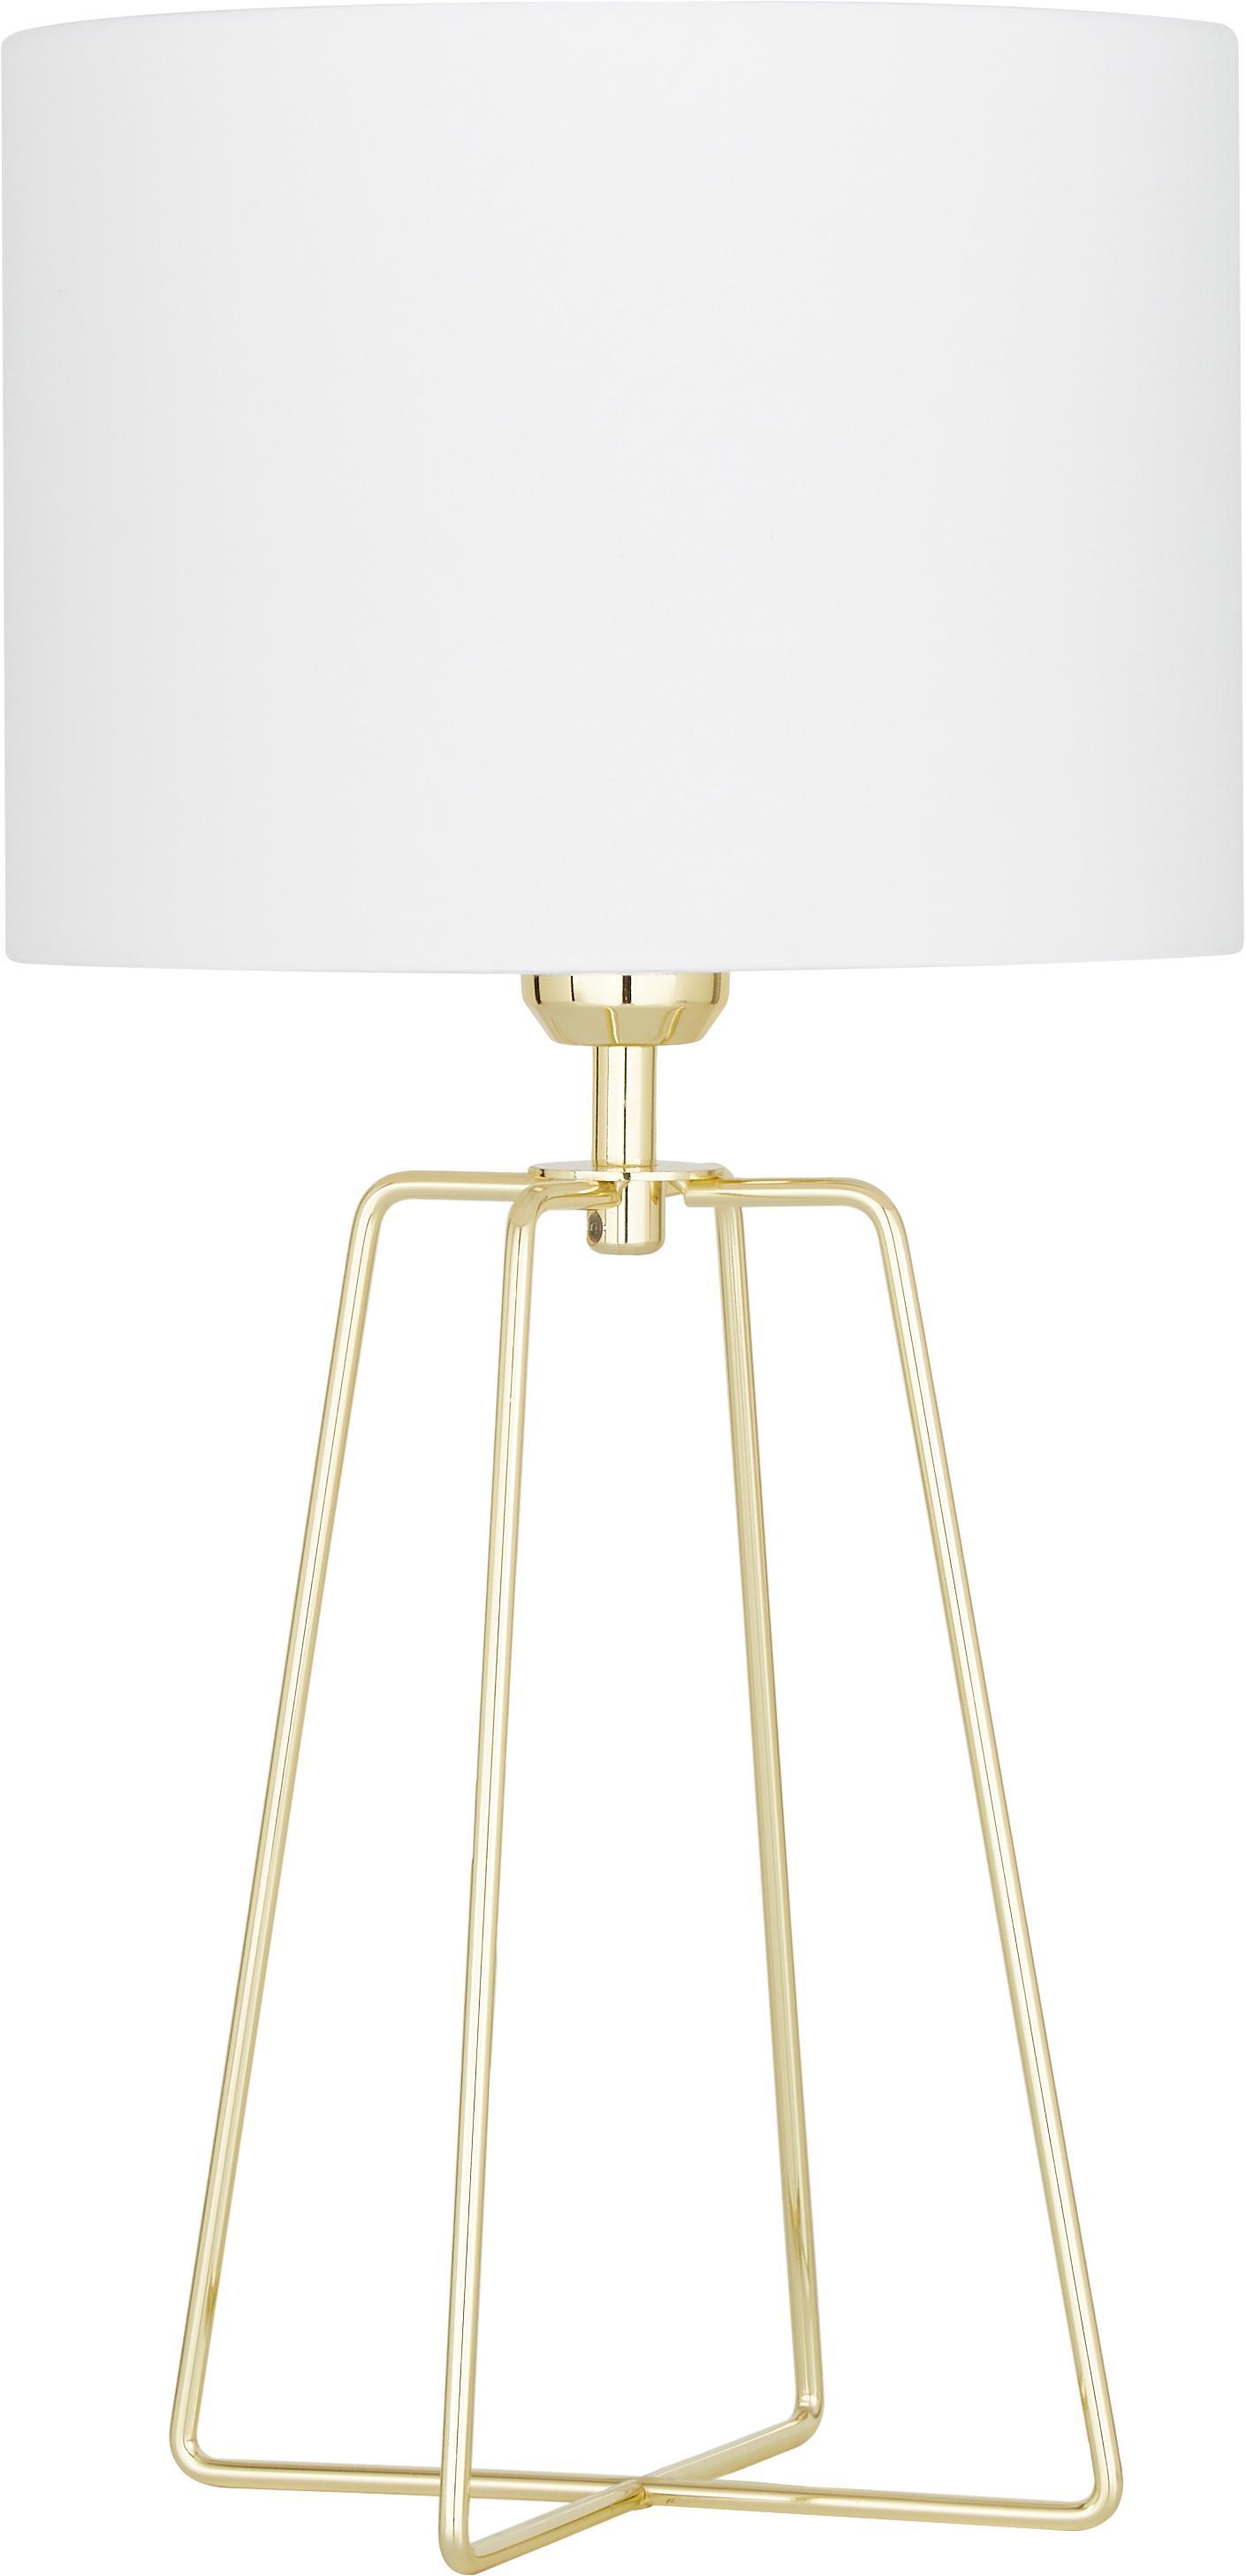 Lámpara de mesa de terciopelo Karolina, Pantalla: terciopelo, Cable: plástico, Blanco, latón brillante, Ø 25 x Al 49 cm